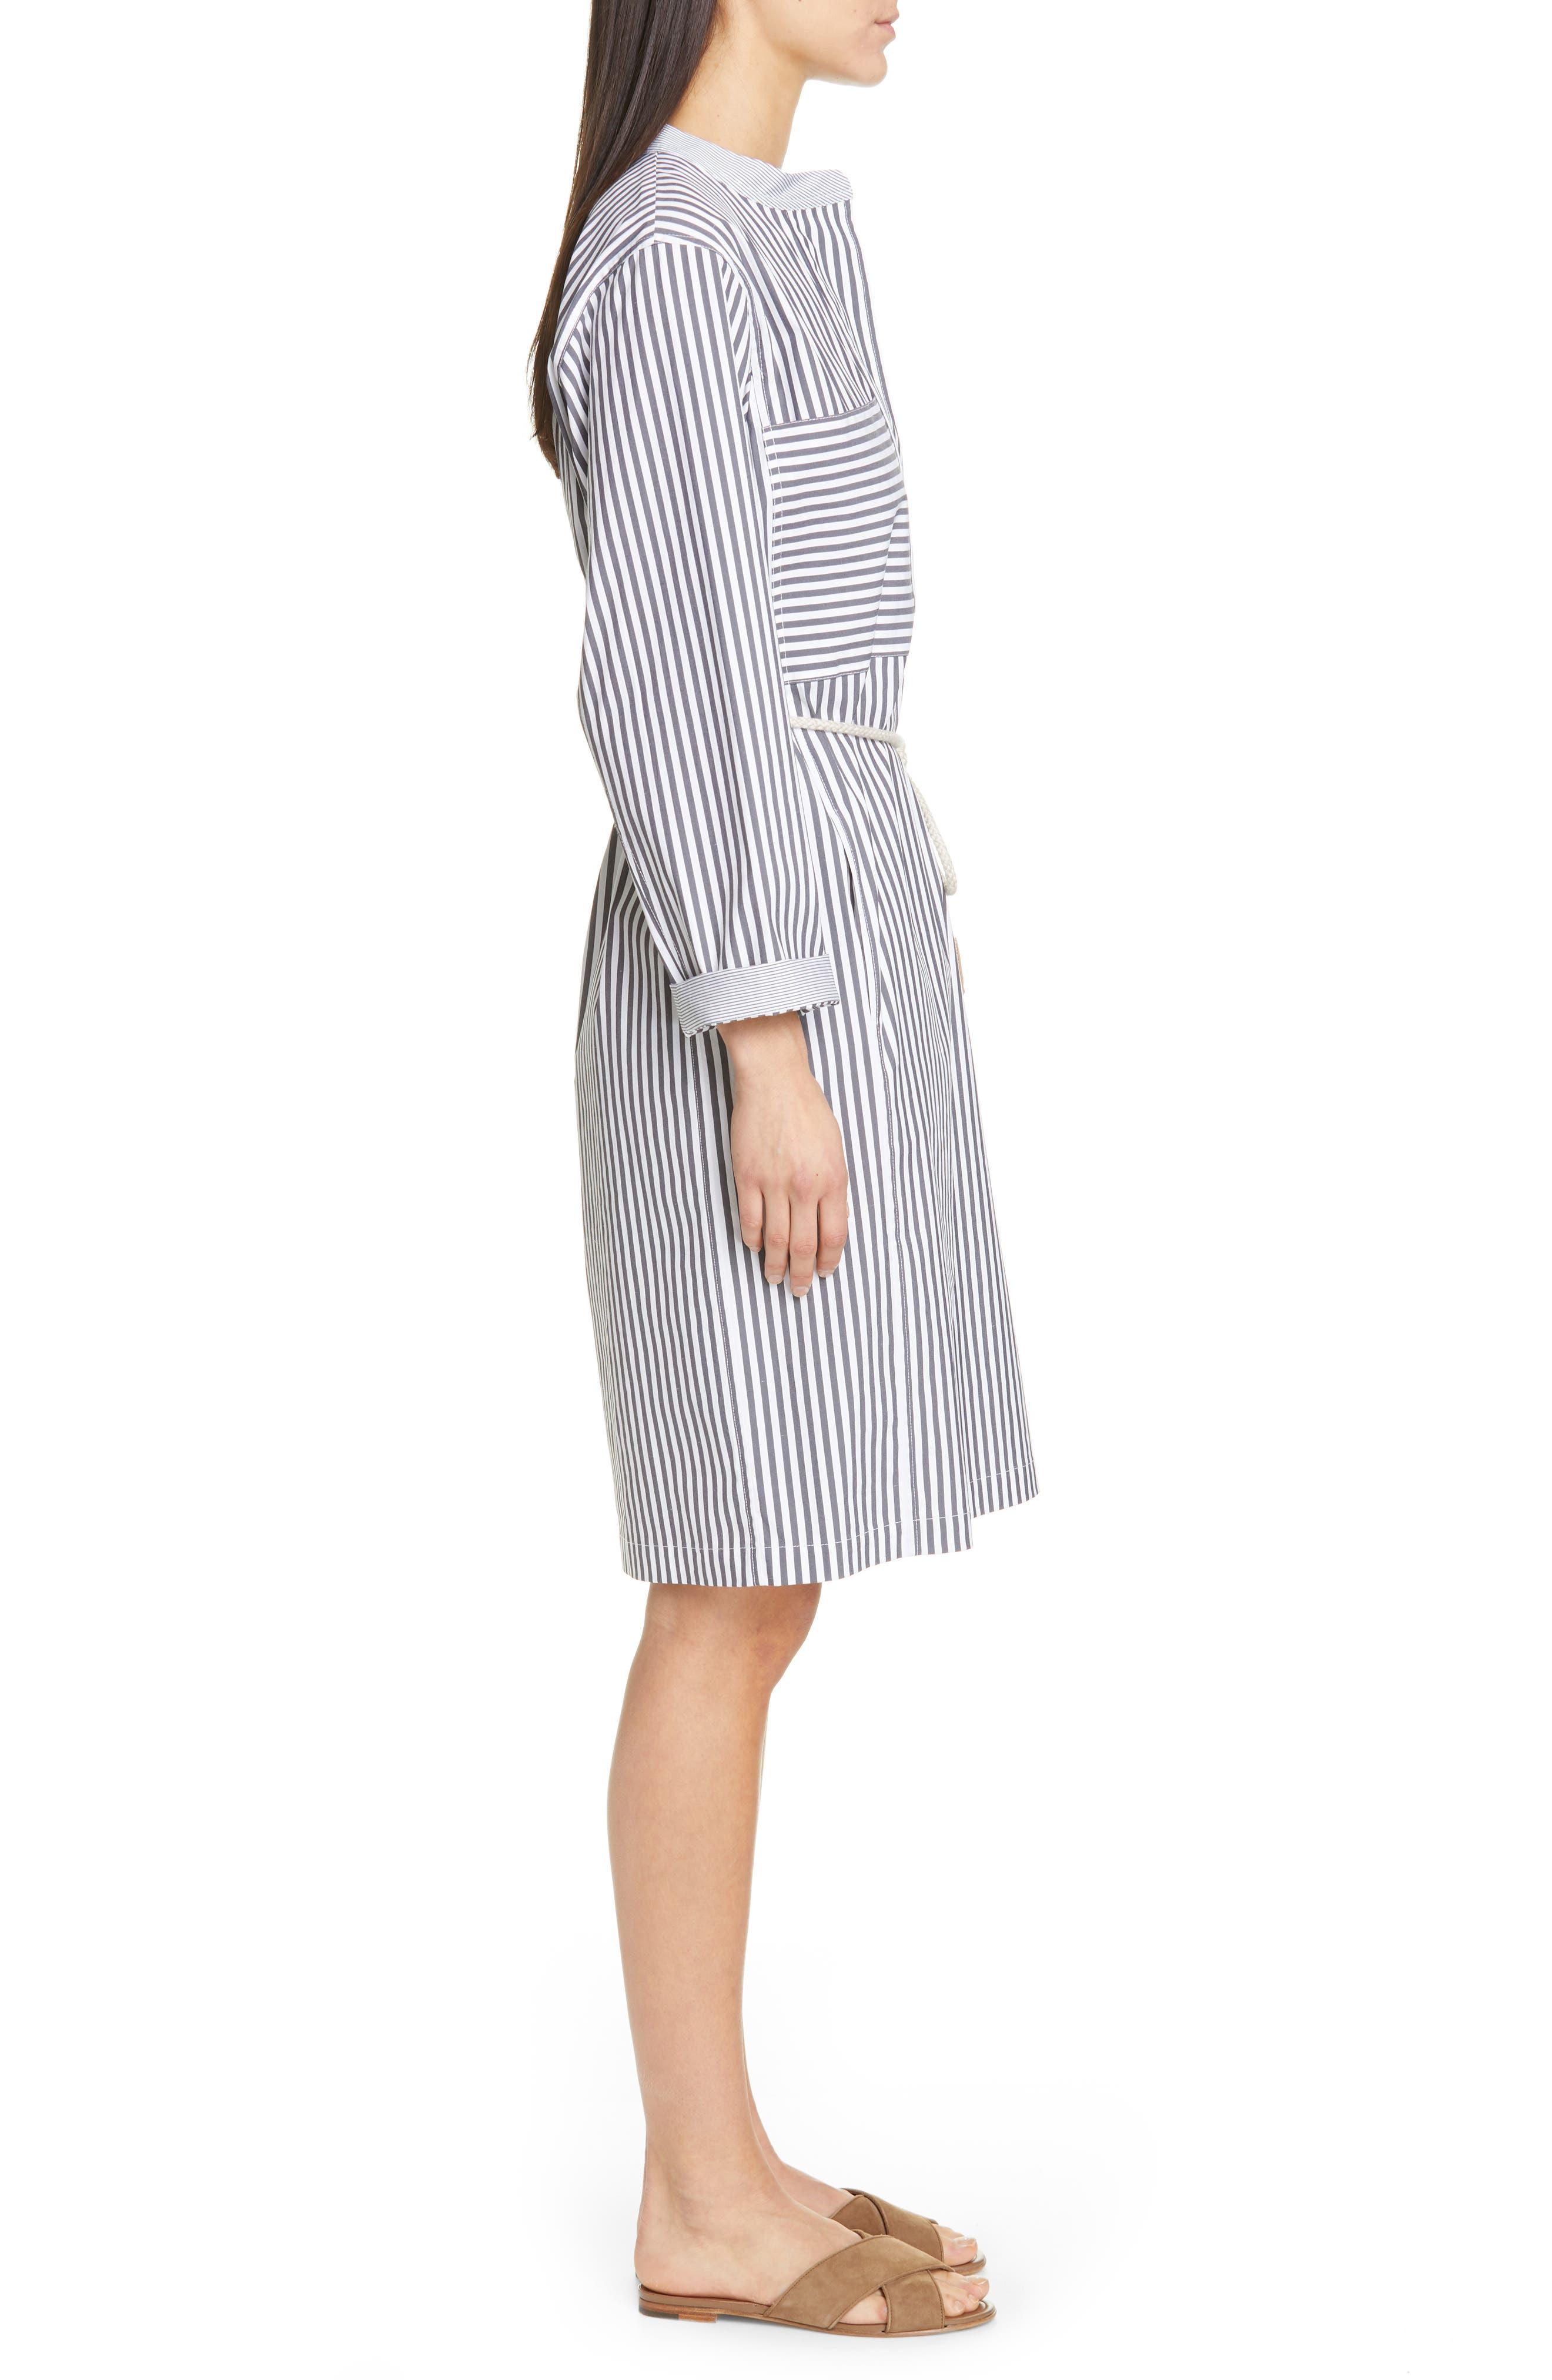 LAFAYETTE 148 NEW YORK, Rexana Stripe Long Sleeve Belted Shirtdress, Alternate thumbnail 4, color, ASH MULTI